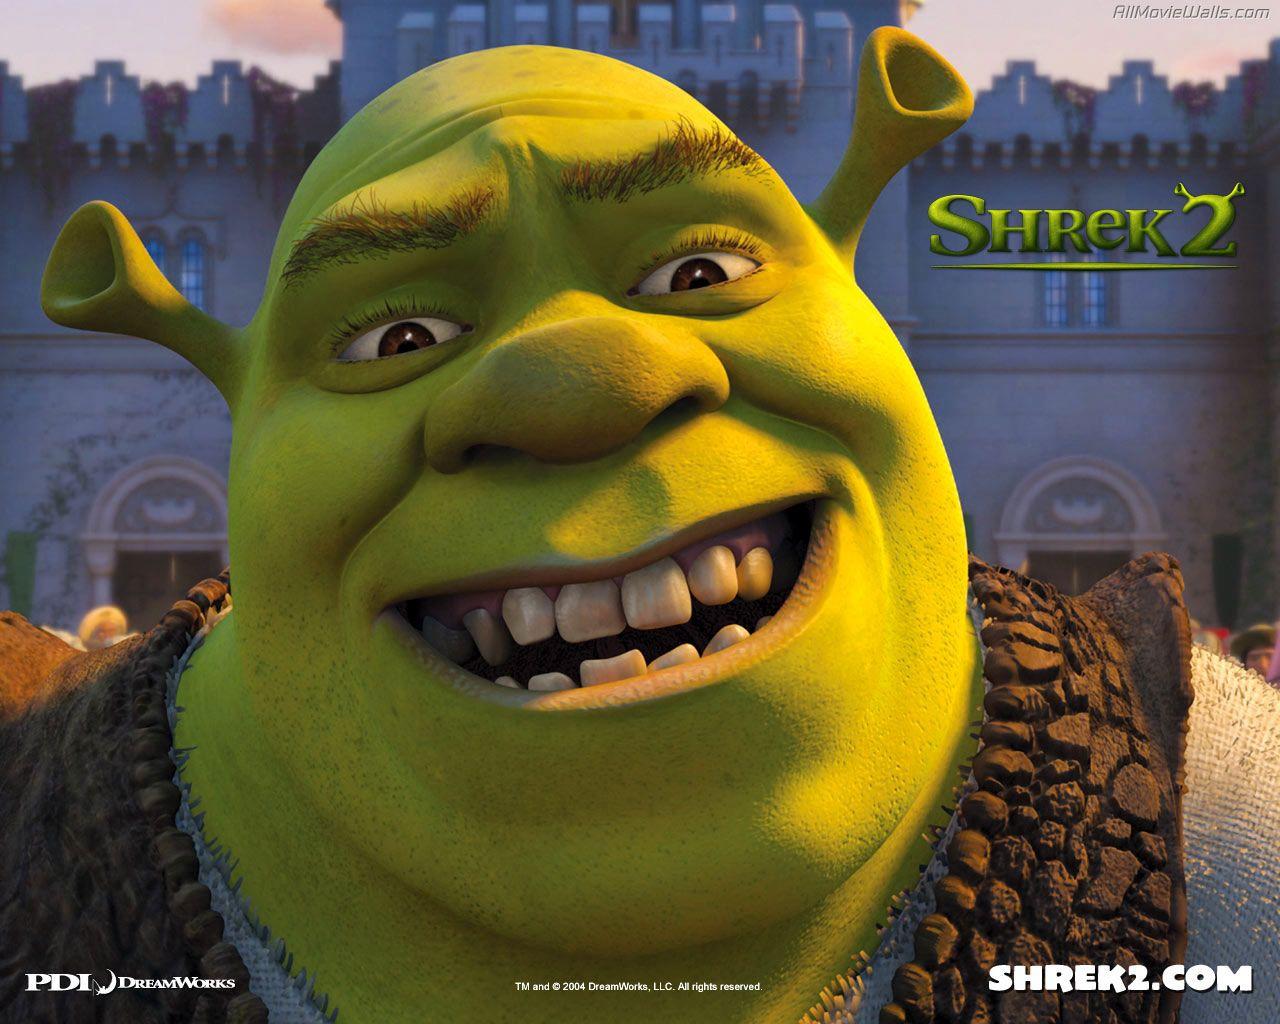 Watch Streaming Hd Shrek 2 Starring Mike Myers Eddie Murphy Cameron Diaz Julie Andrews Princess Fiona S Parent Shrek Gingerbread Man Shrek Animated Movies